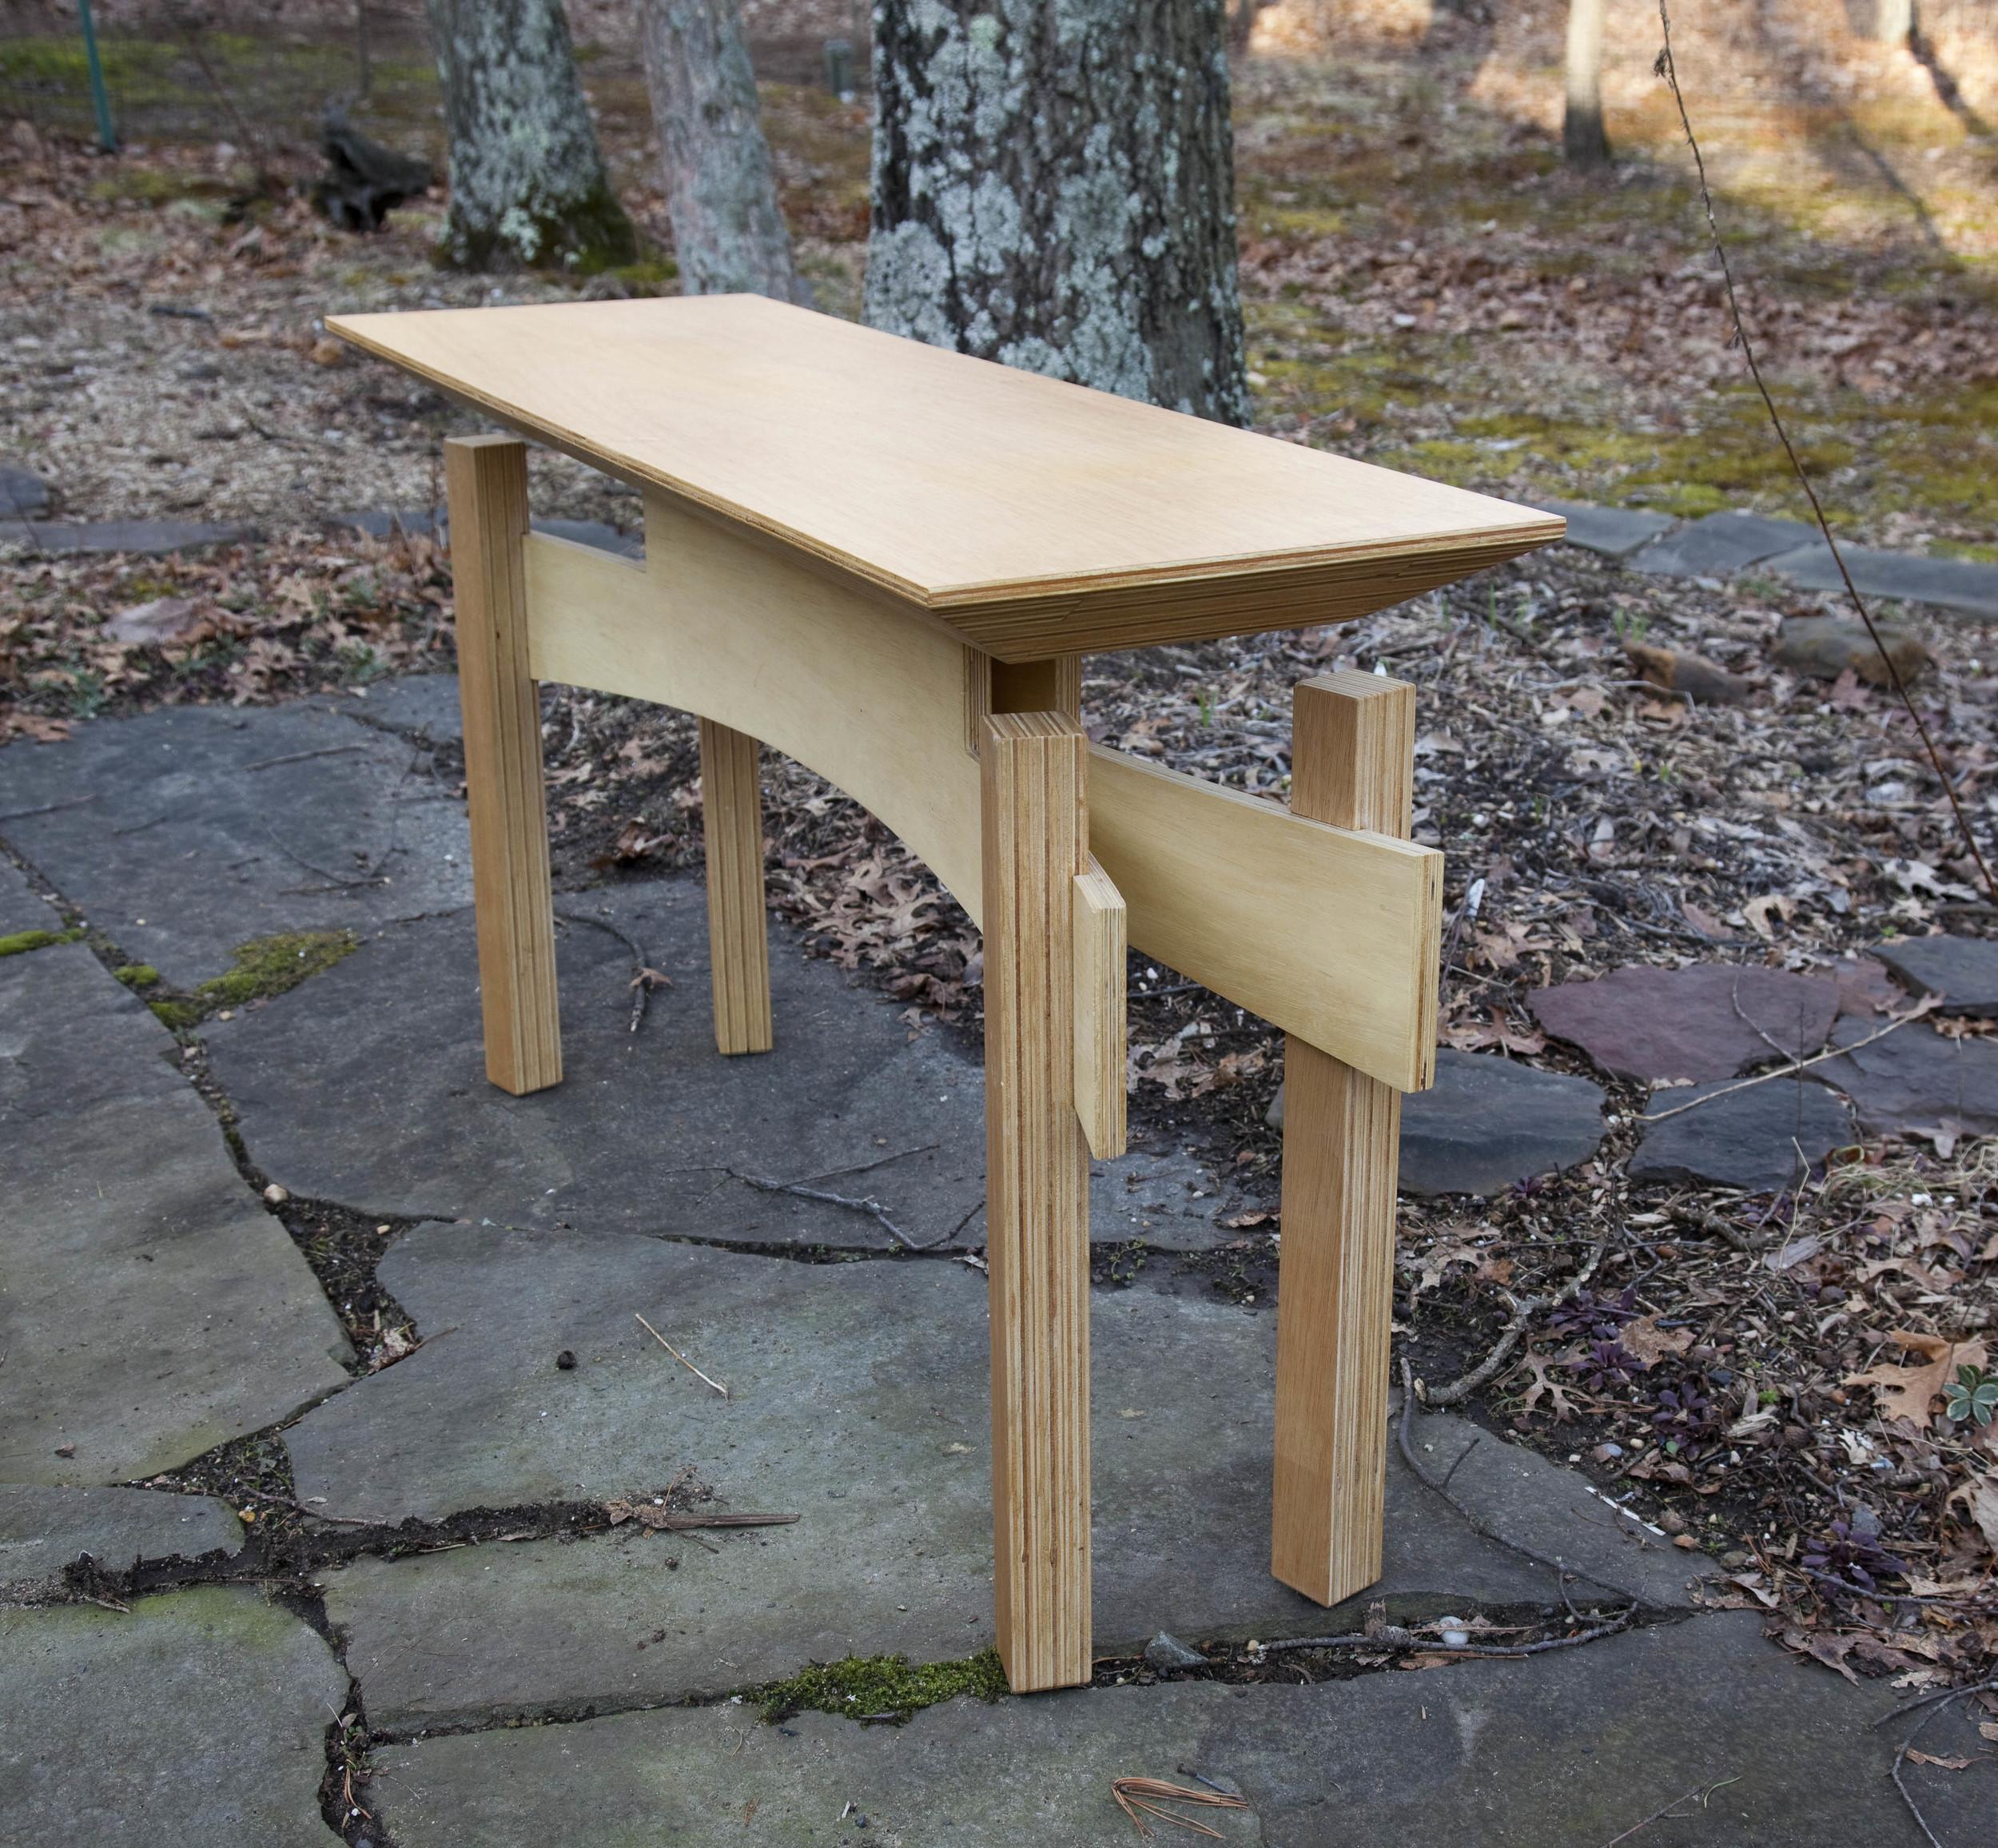 Plywood sideboard table by valebruck.com